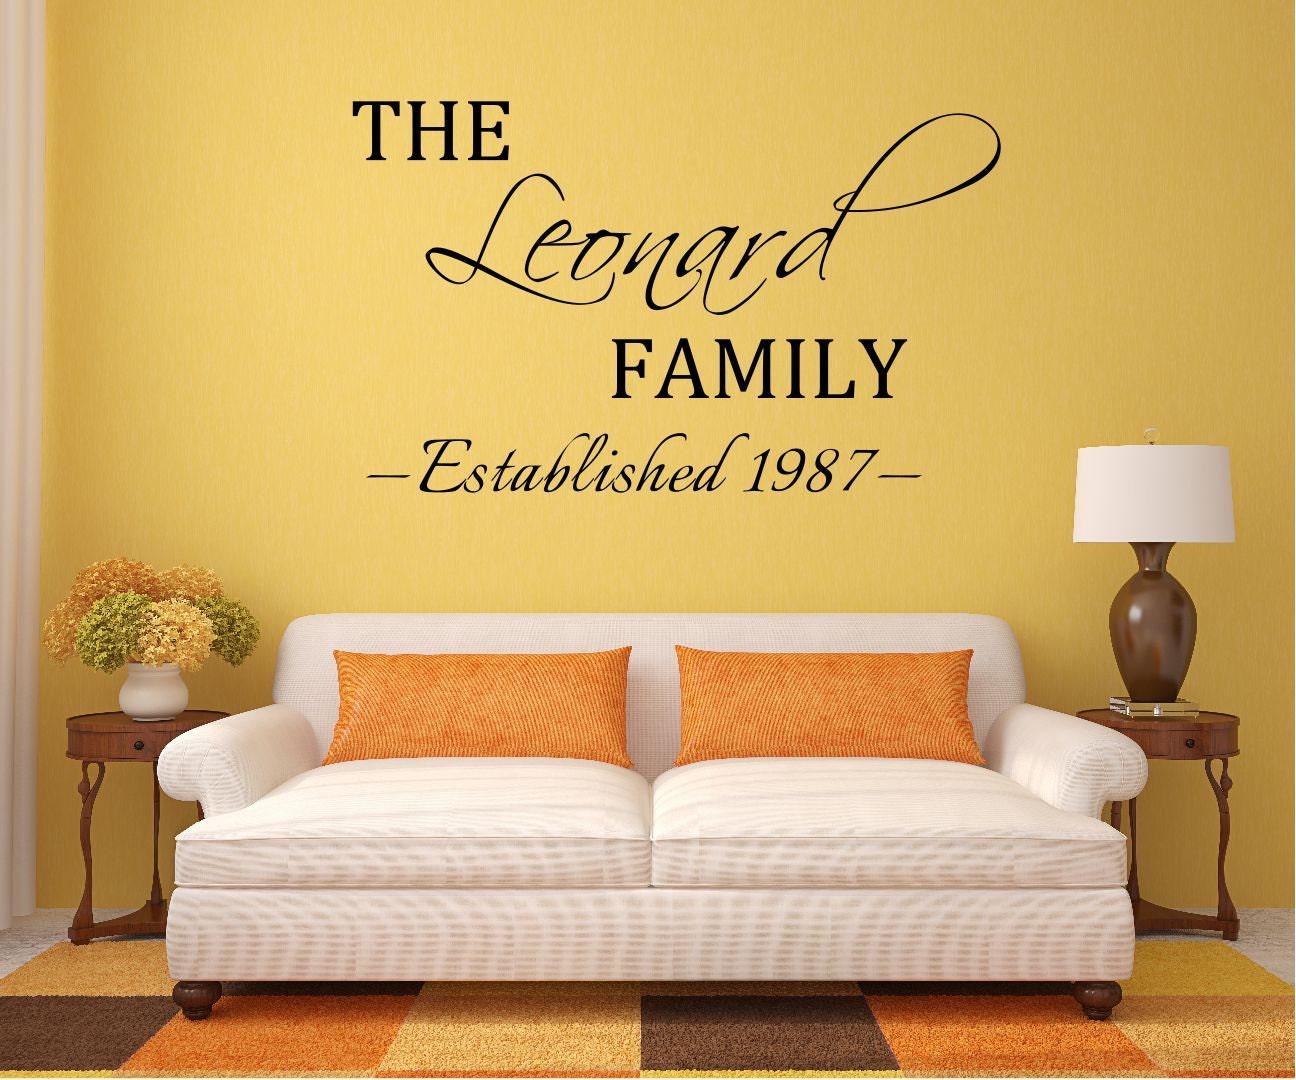 Custom Family Name Vinyl Decal Family Vinyl Wall Art Decal | Etsy